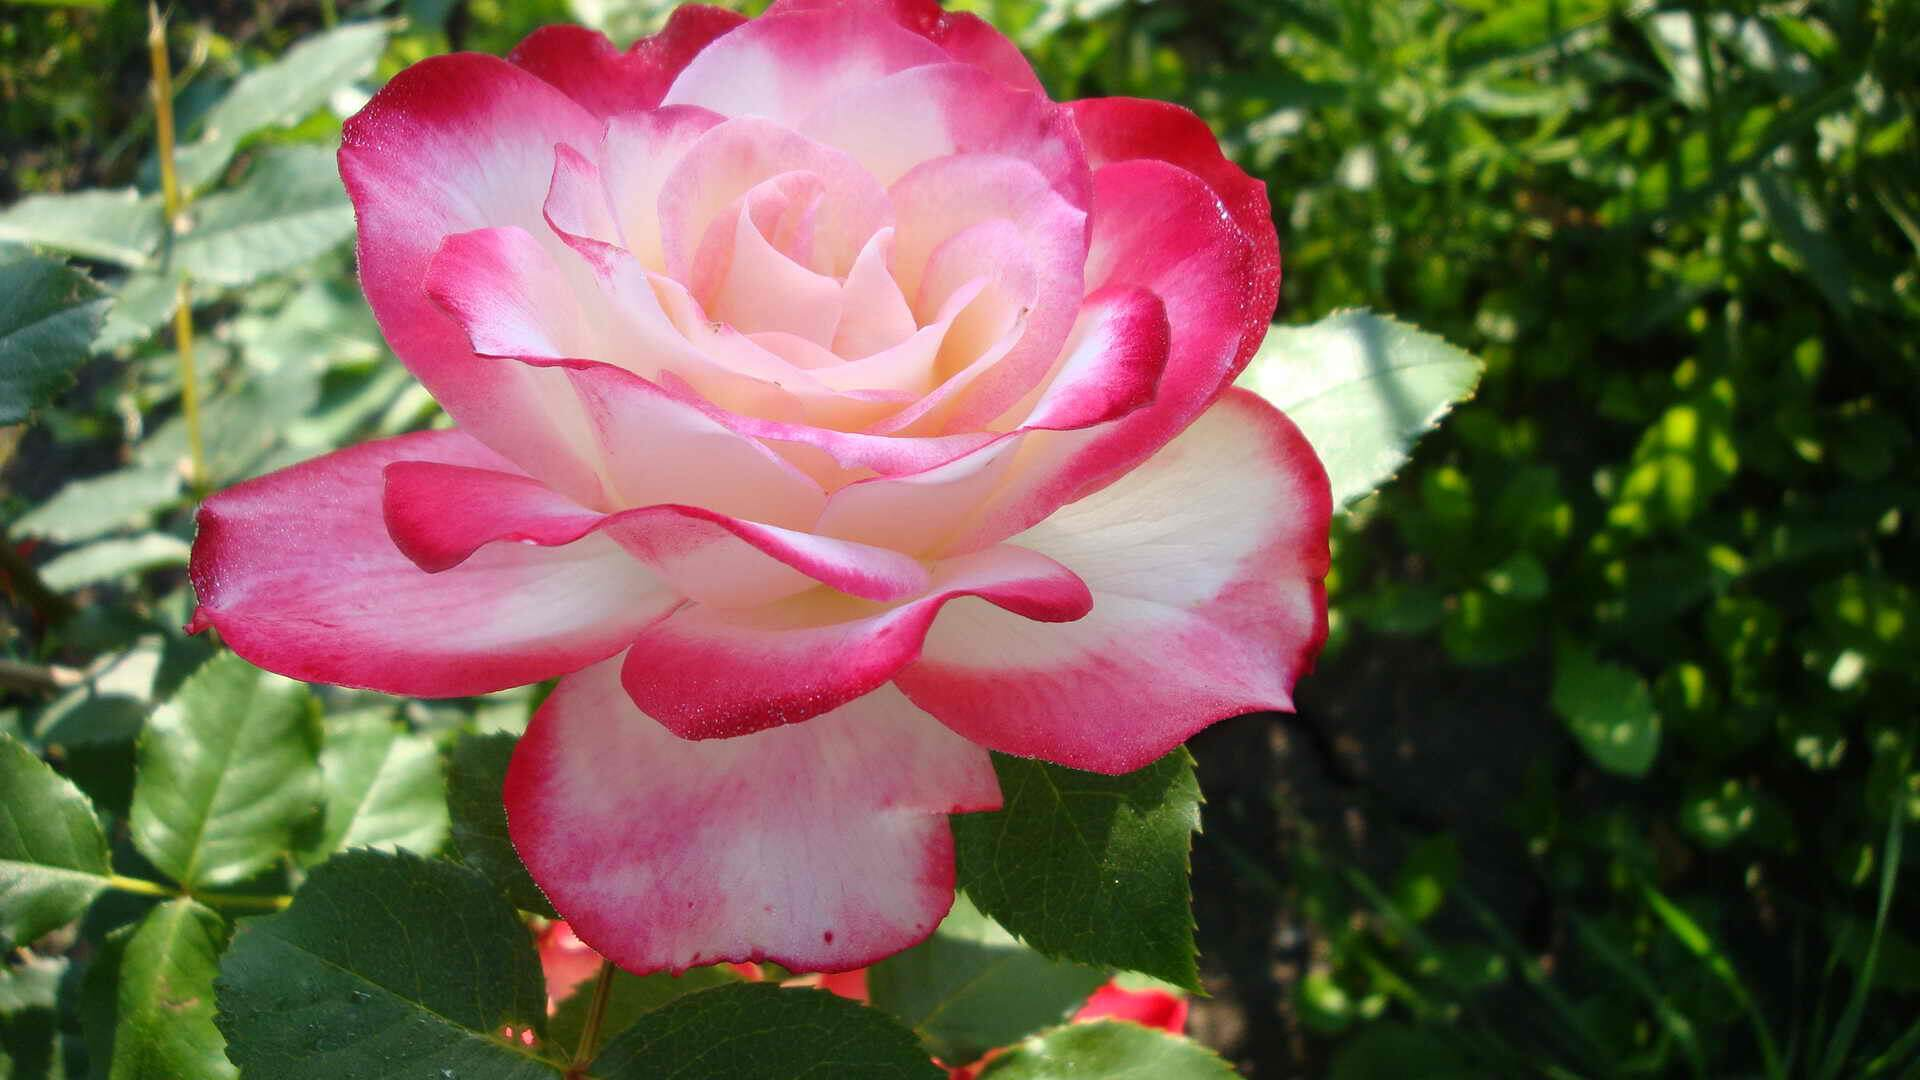 Роза принцесса монако (princesse de monaco) — характеристики сорта